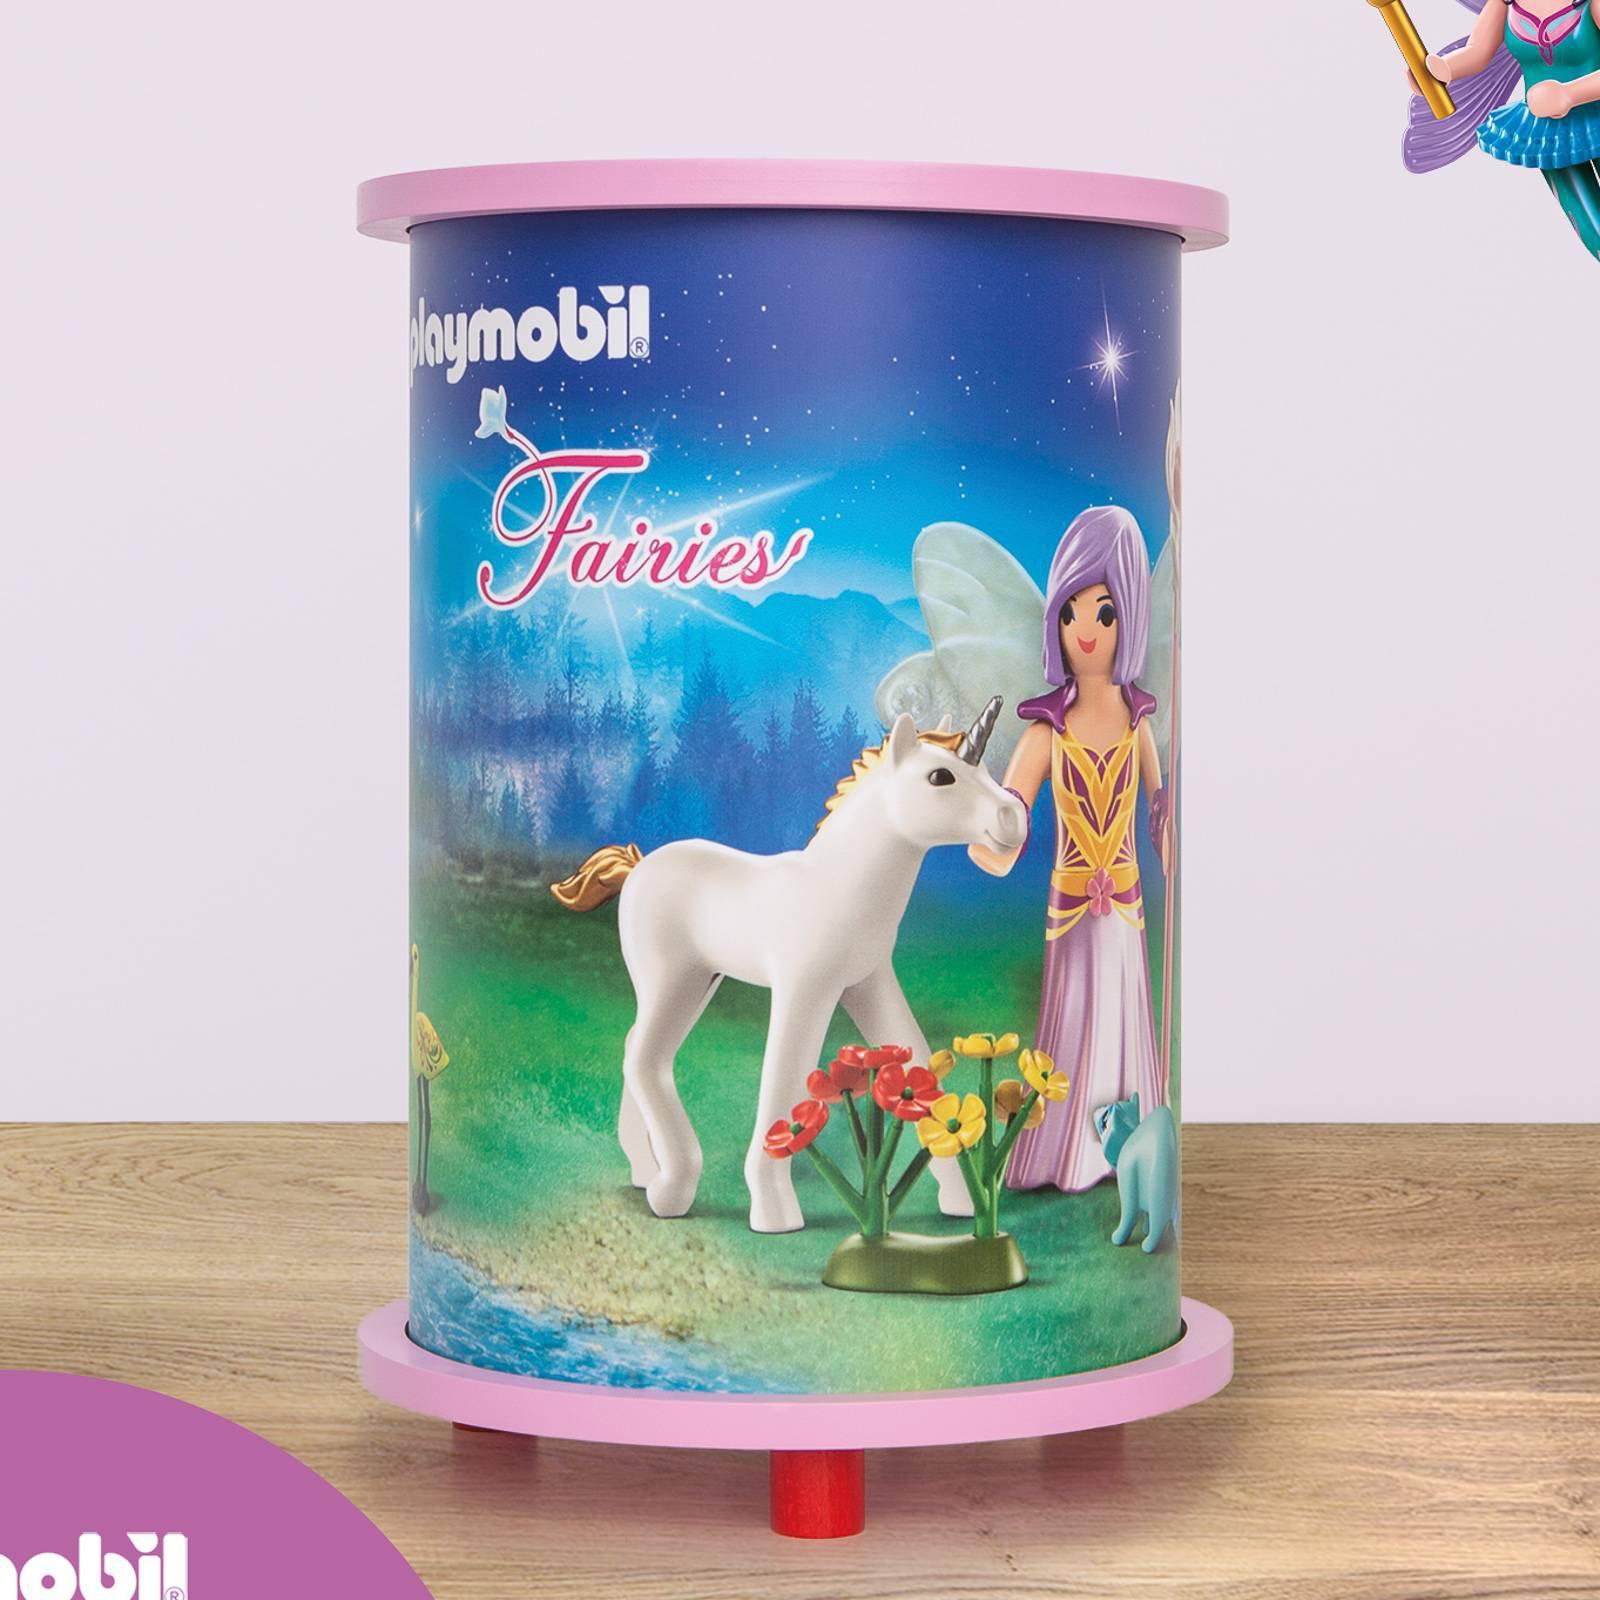 Bordlampe 25/15 PLAYMOBIL Fairies